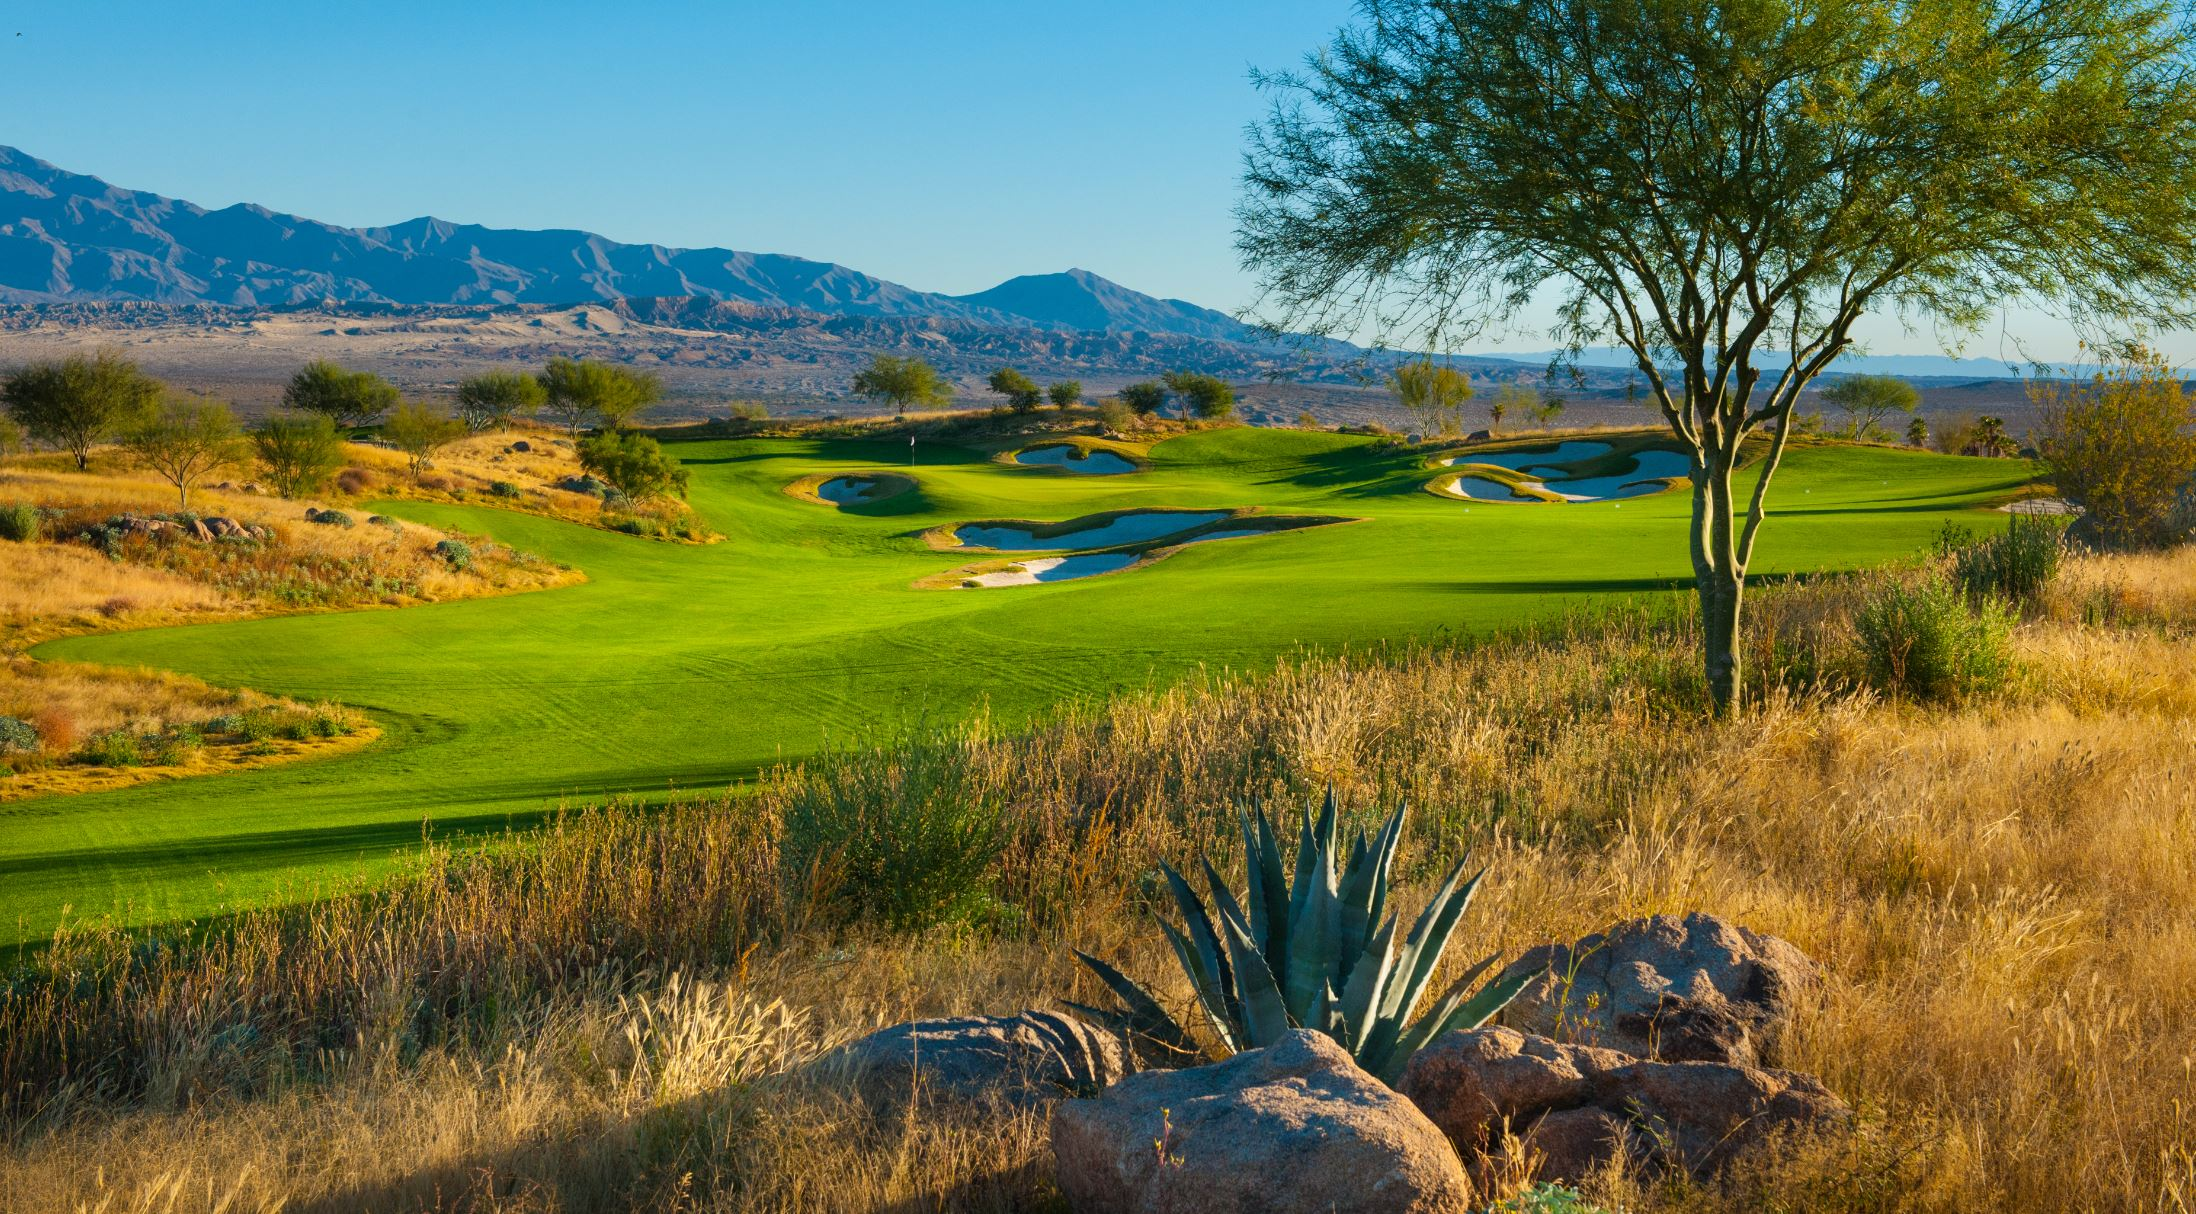 The-17th-hole-at-the-Rams-Hill-Golf-Club-in-Borrego-Springs.-Rams-Hill-Golf-Club.jpg